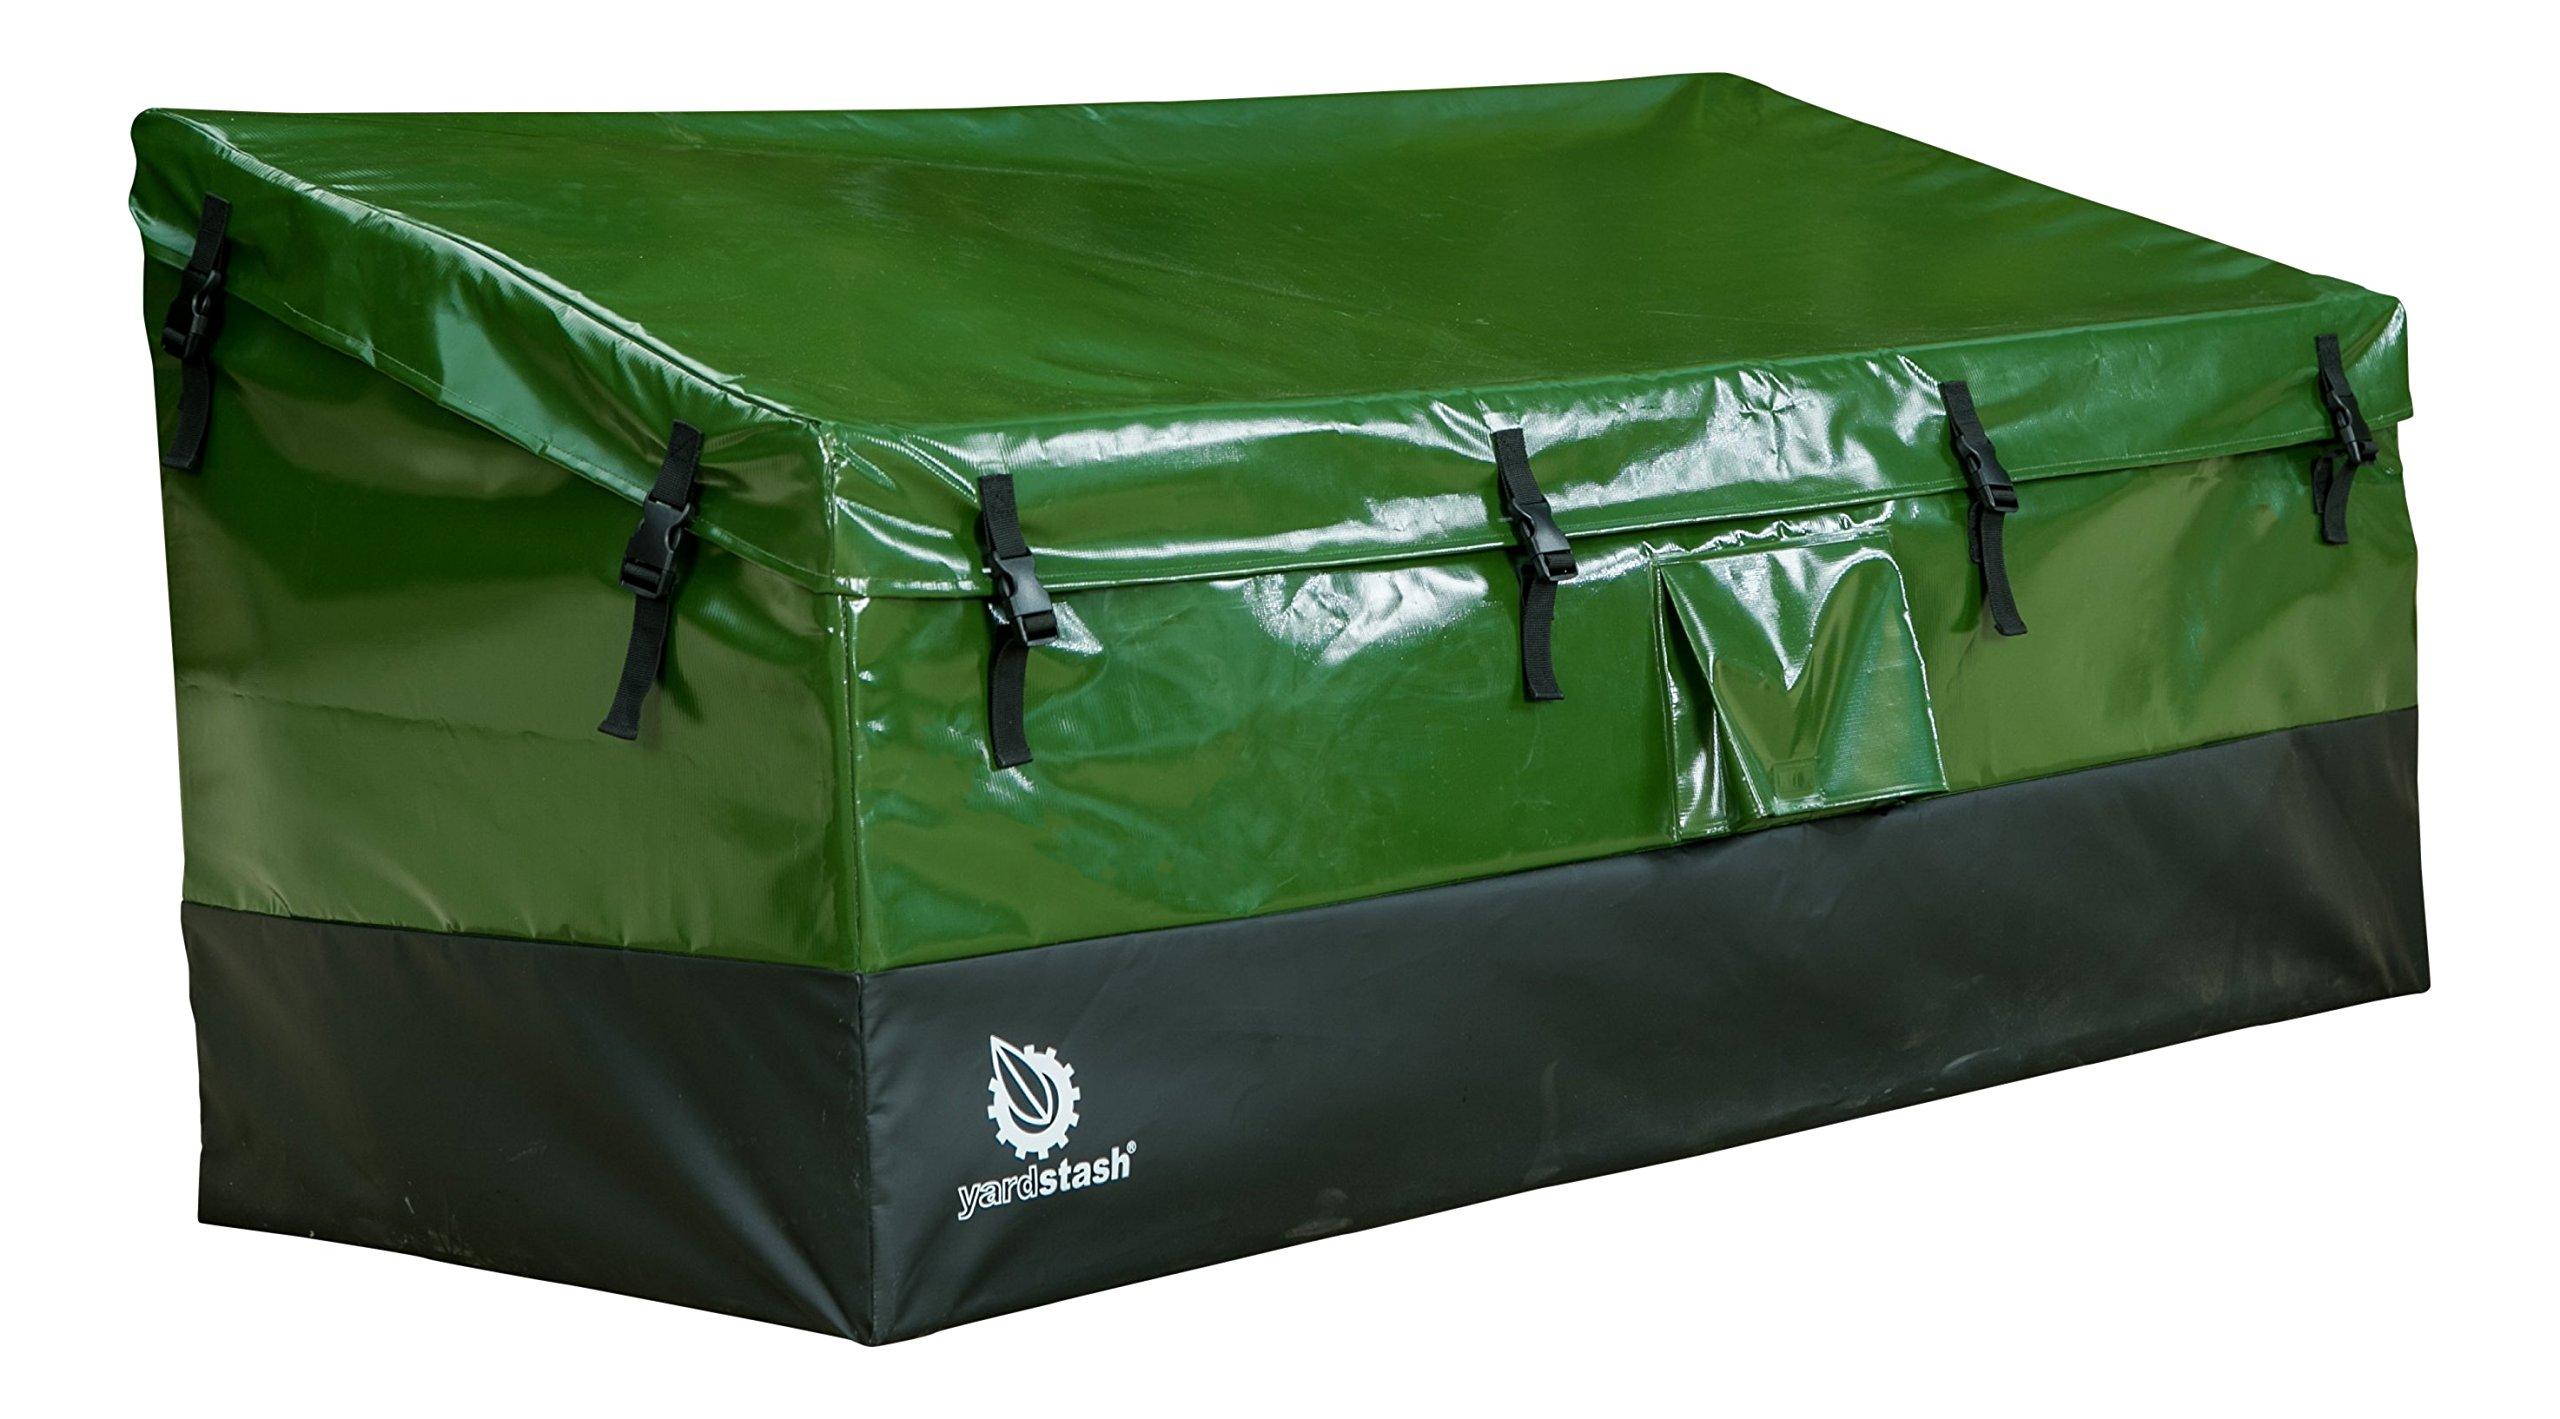 YardStash Outdoor Storage Deck Box XL: Easy Assembly, Portable, Versatile (150 Gallon, 20 Cubic Feet, Green)